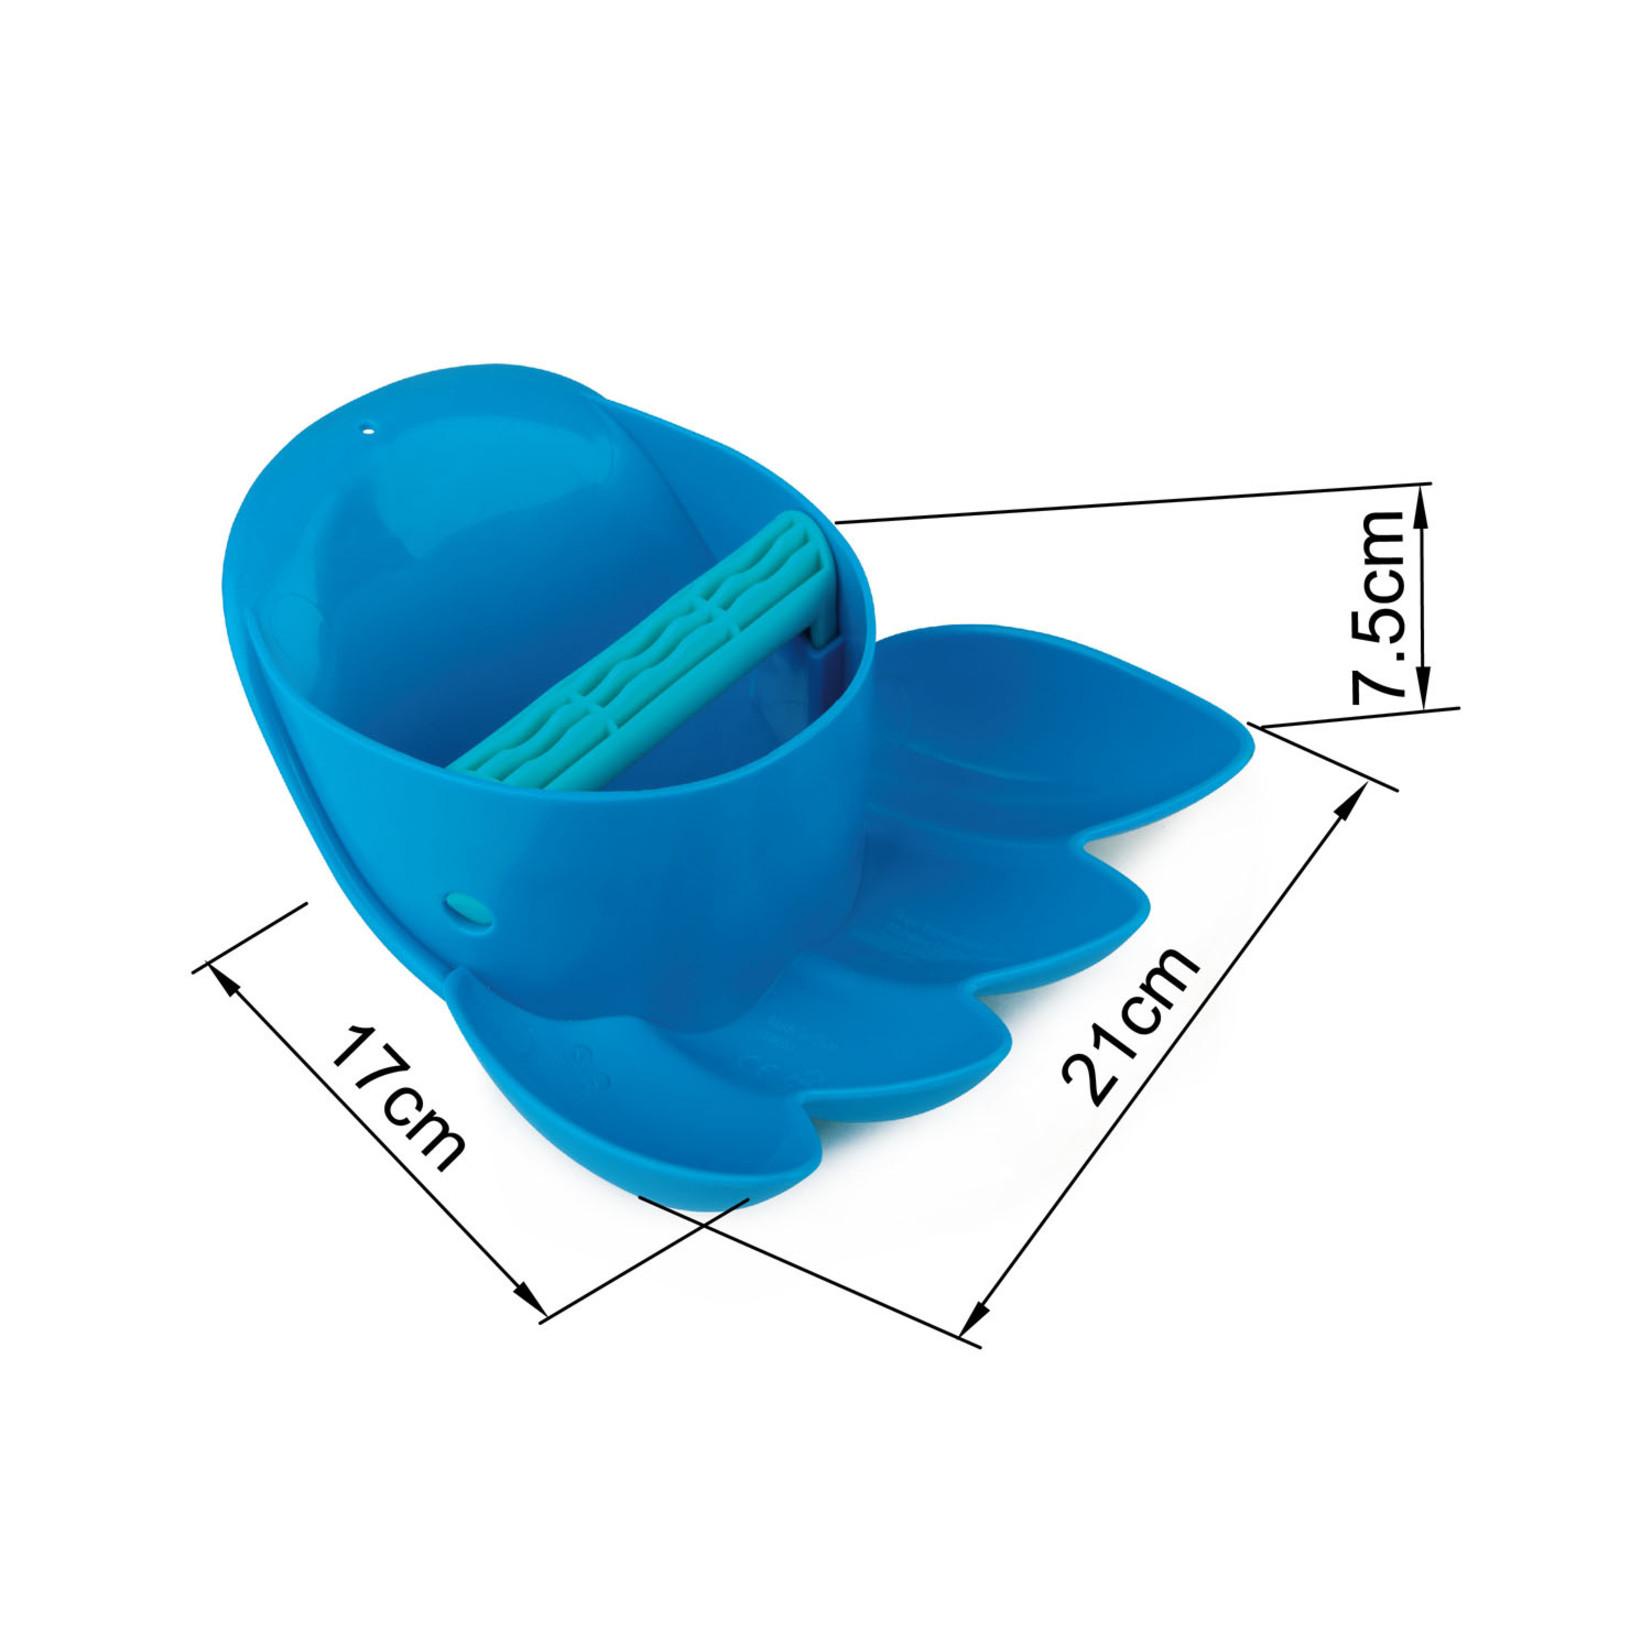 HAPE POWER PAW, BLUE